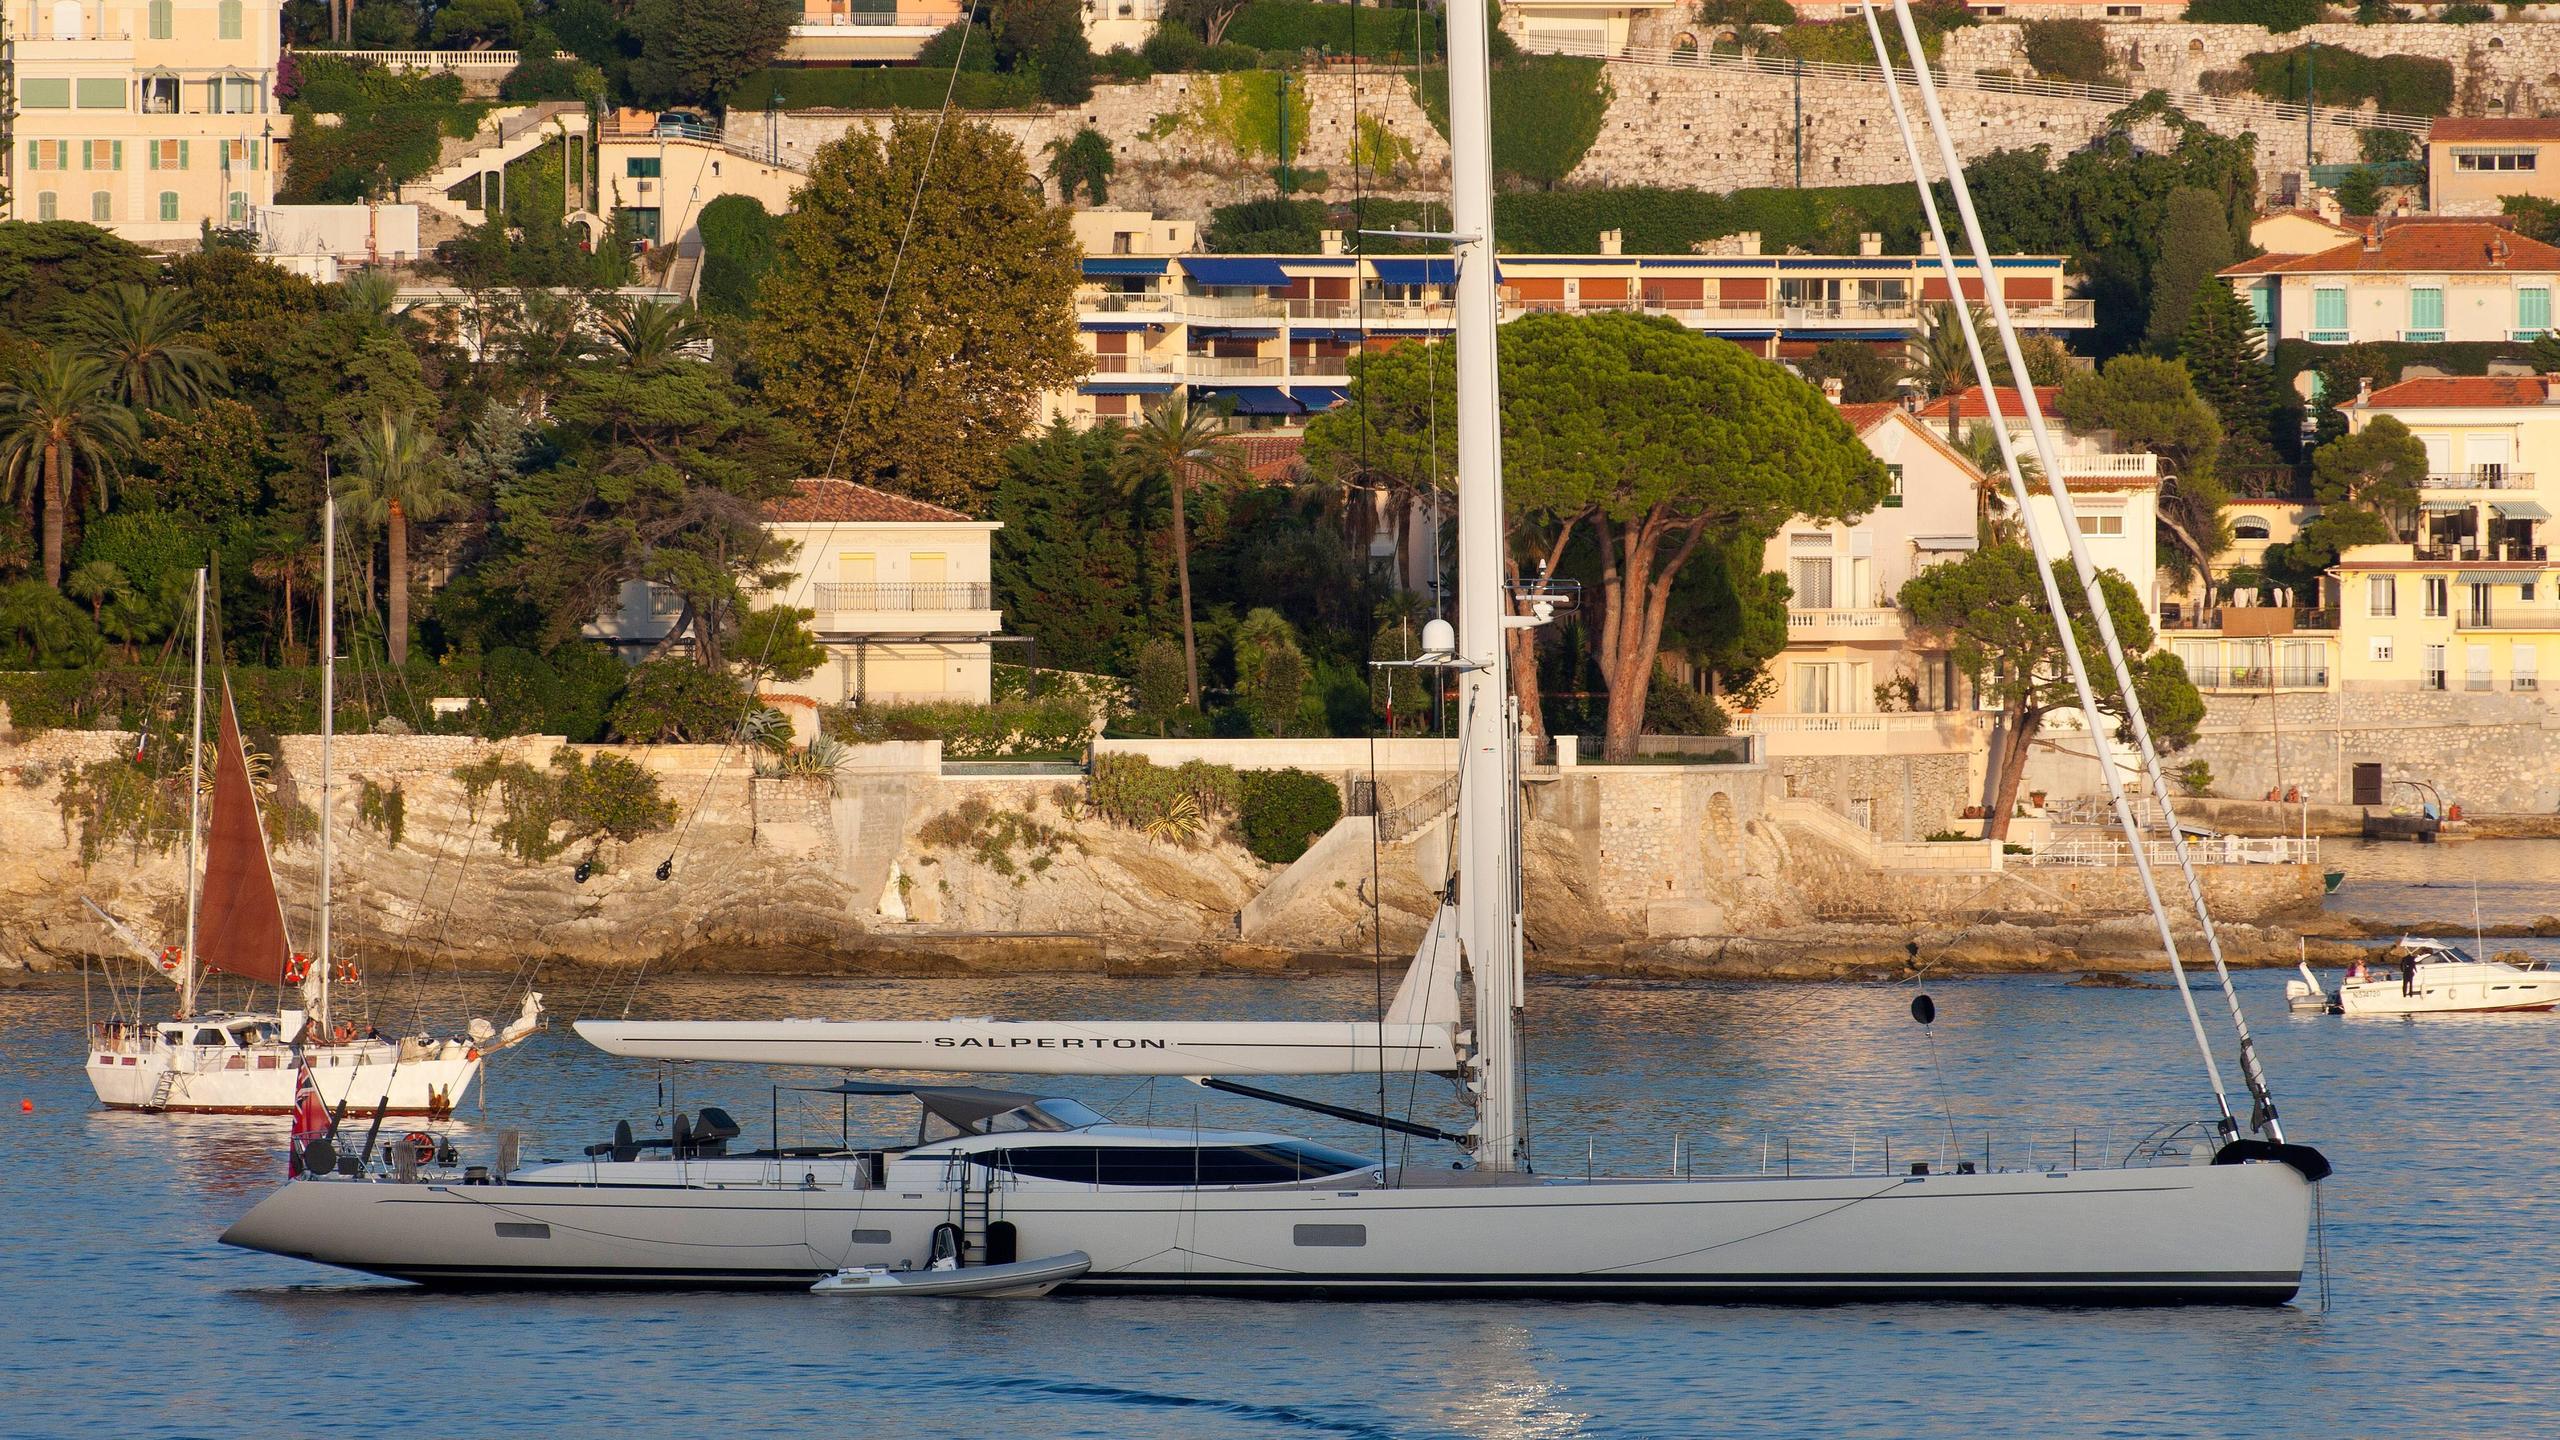 palmira-salperton-sailing-yacht-fitzroy-2009-45m-profile